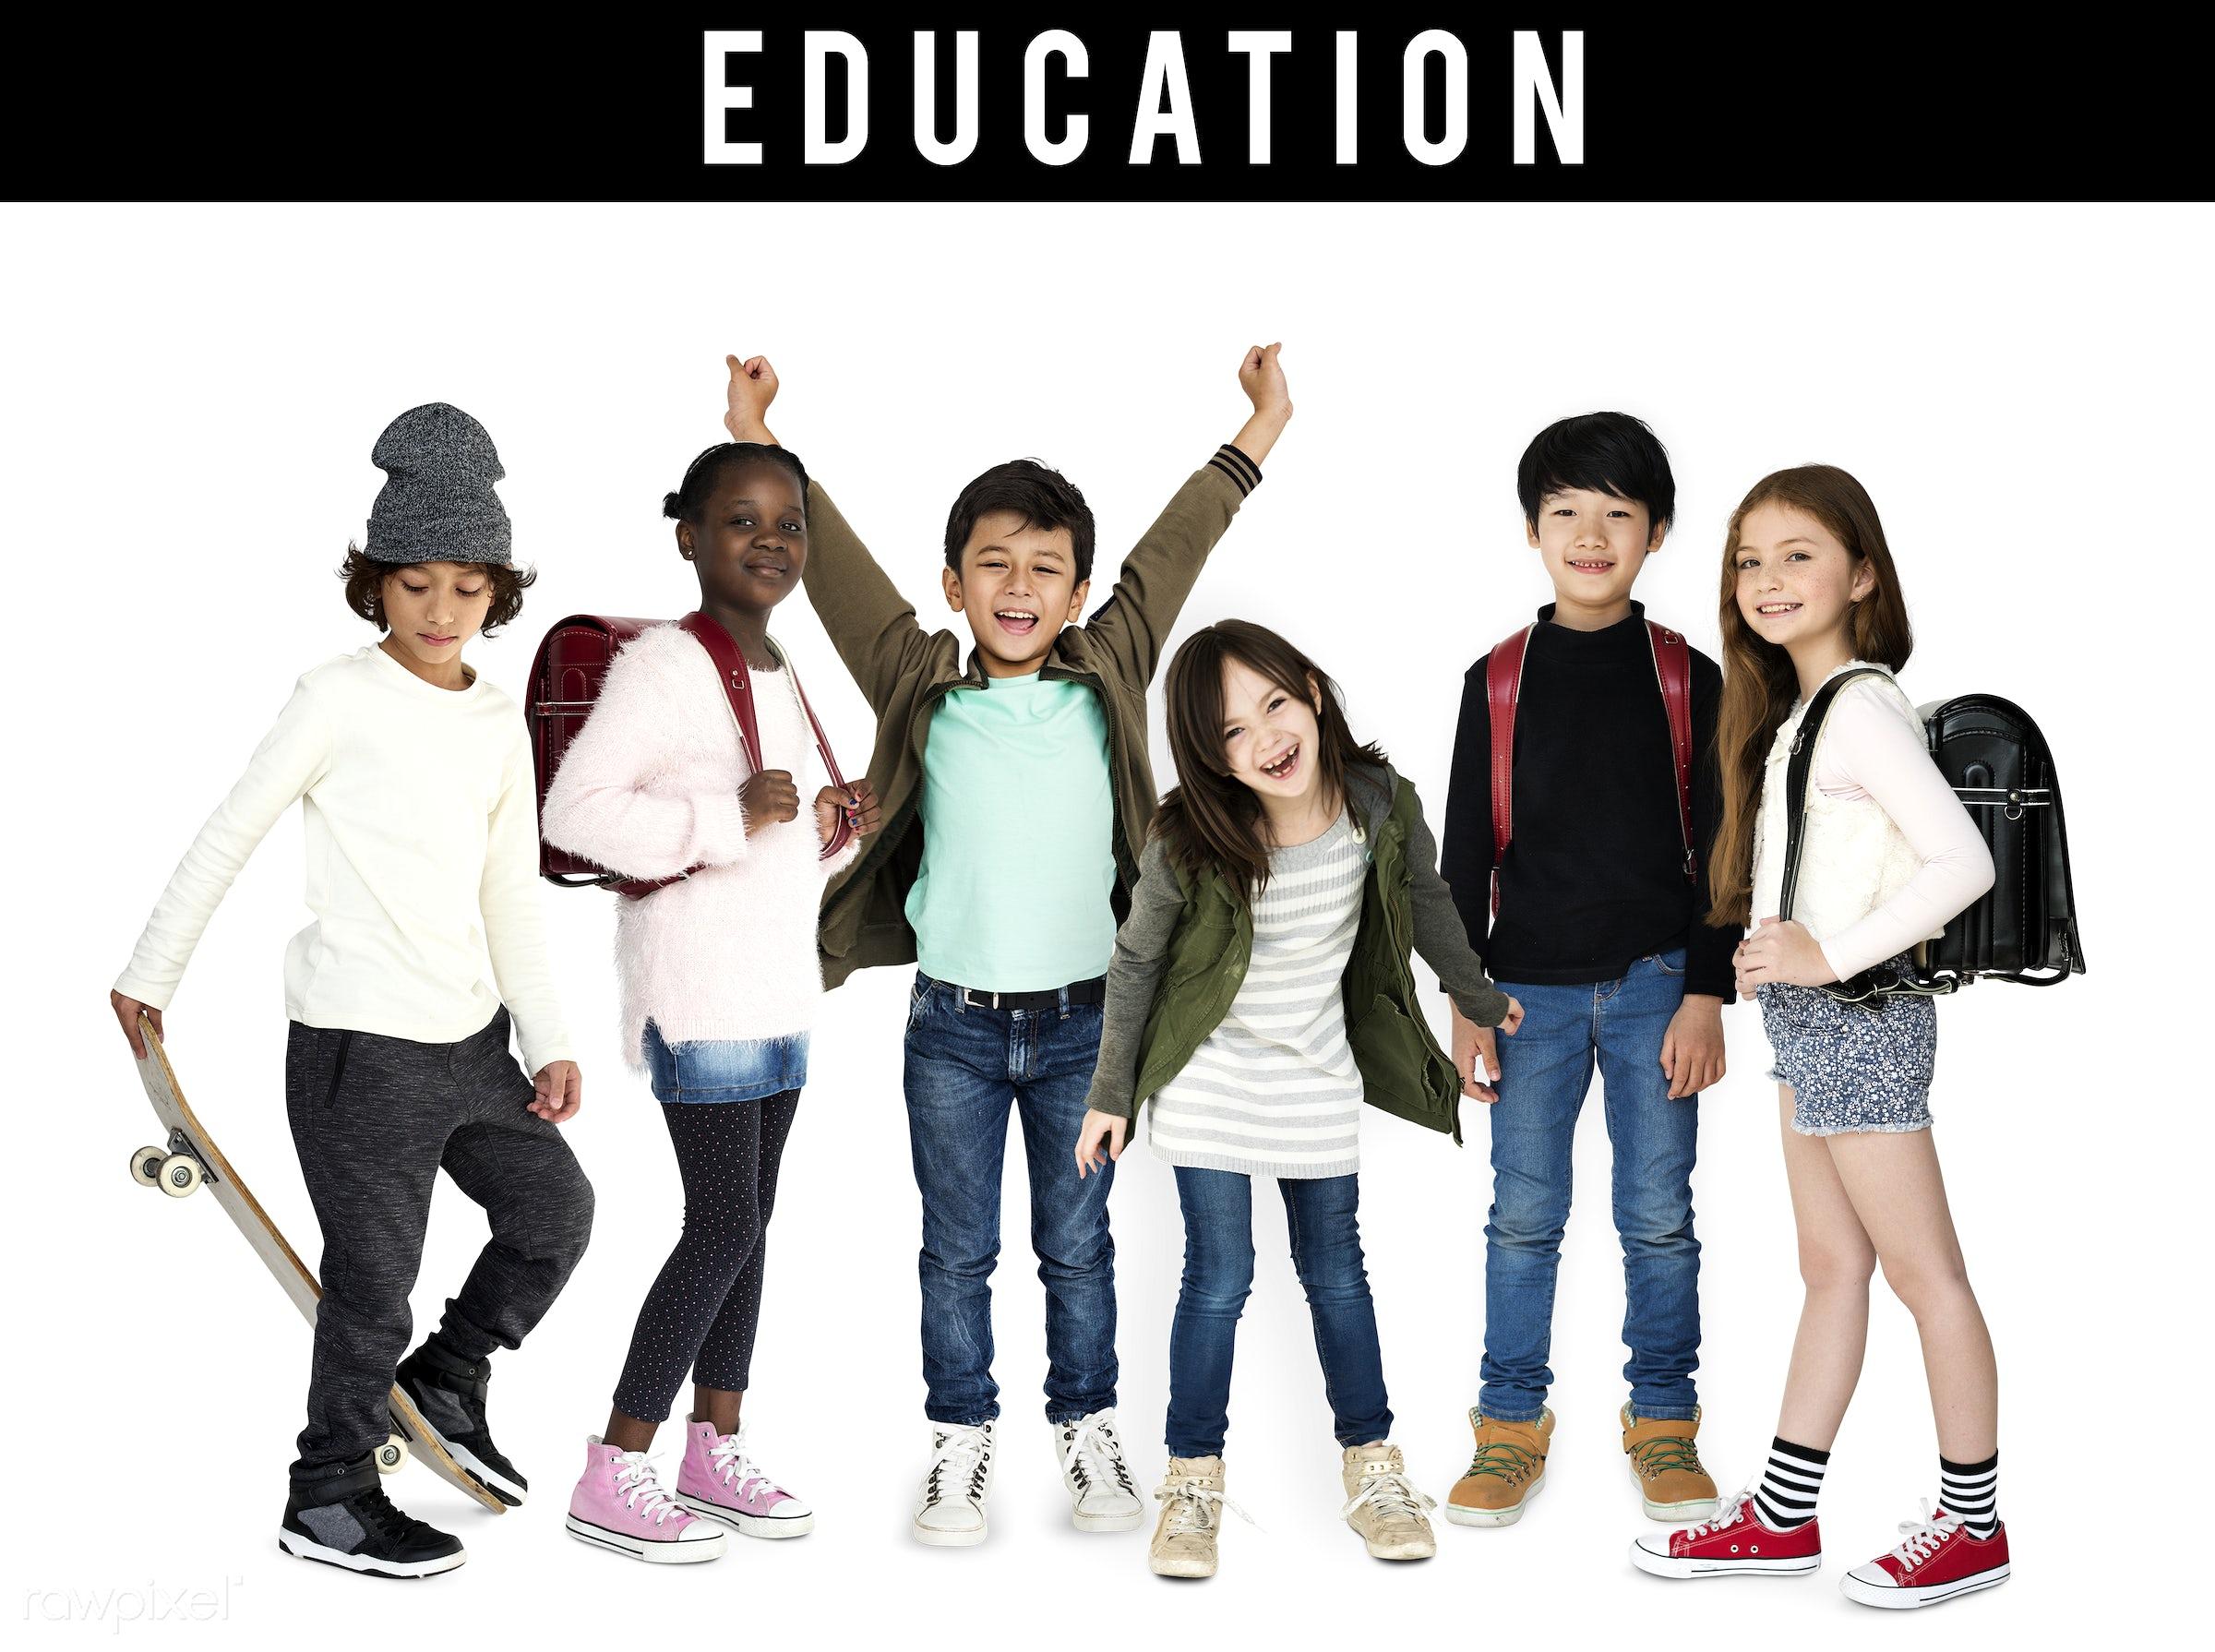 Diverse people set - studio, person, diverse, set, children, little, study, collection, education, people, kid, child,...